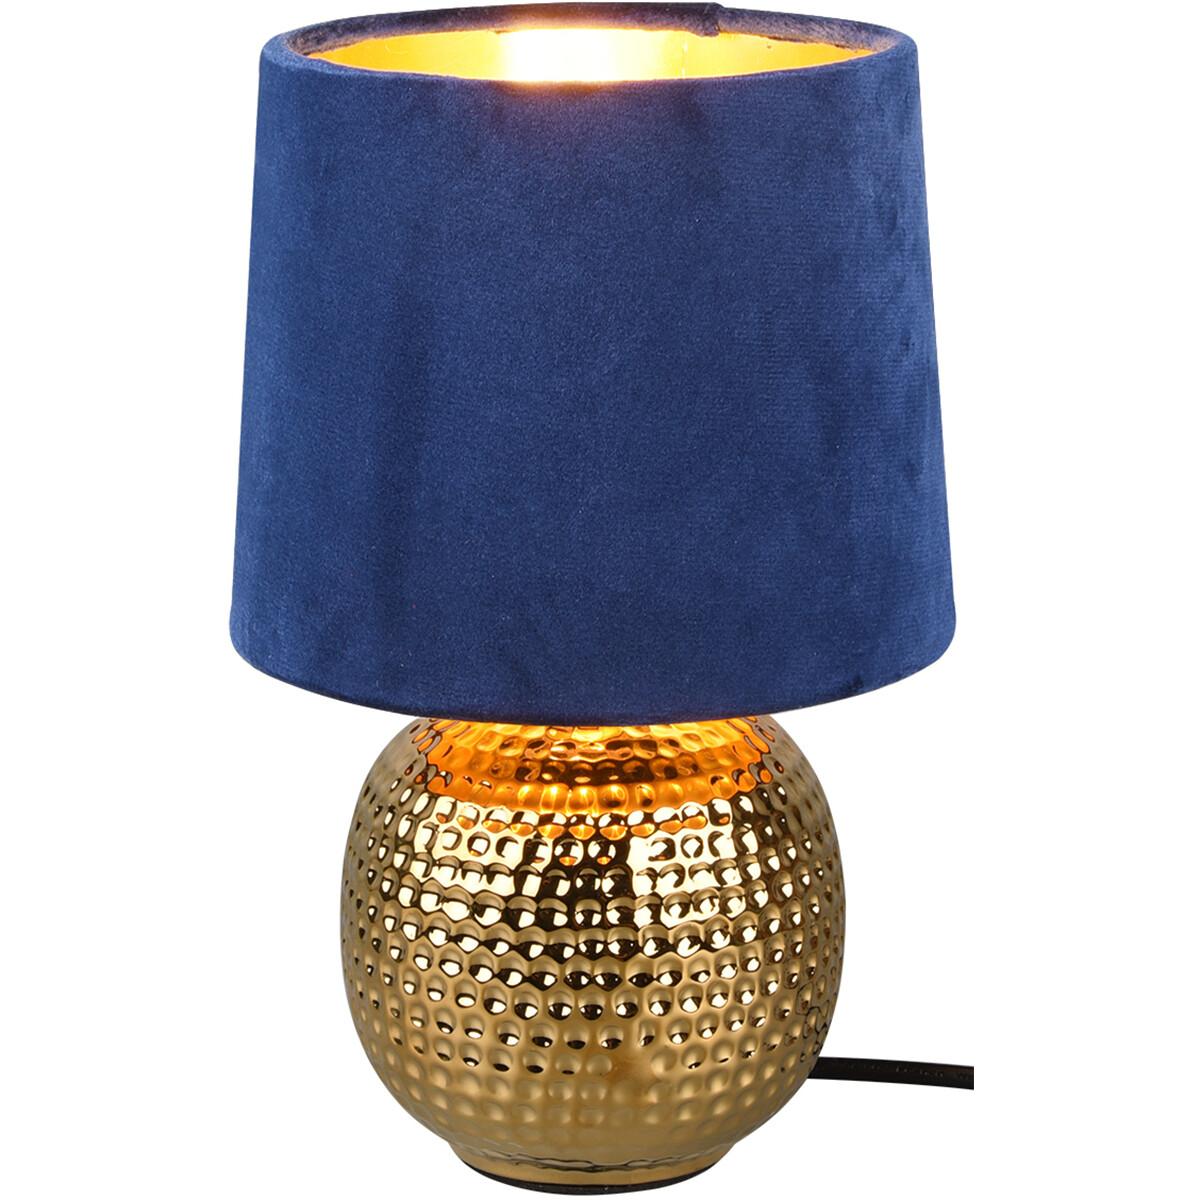 LED Tafellamp - Trion Sofia - E14 Fitting - Rond - Mat Blauw - Keramiek